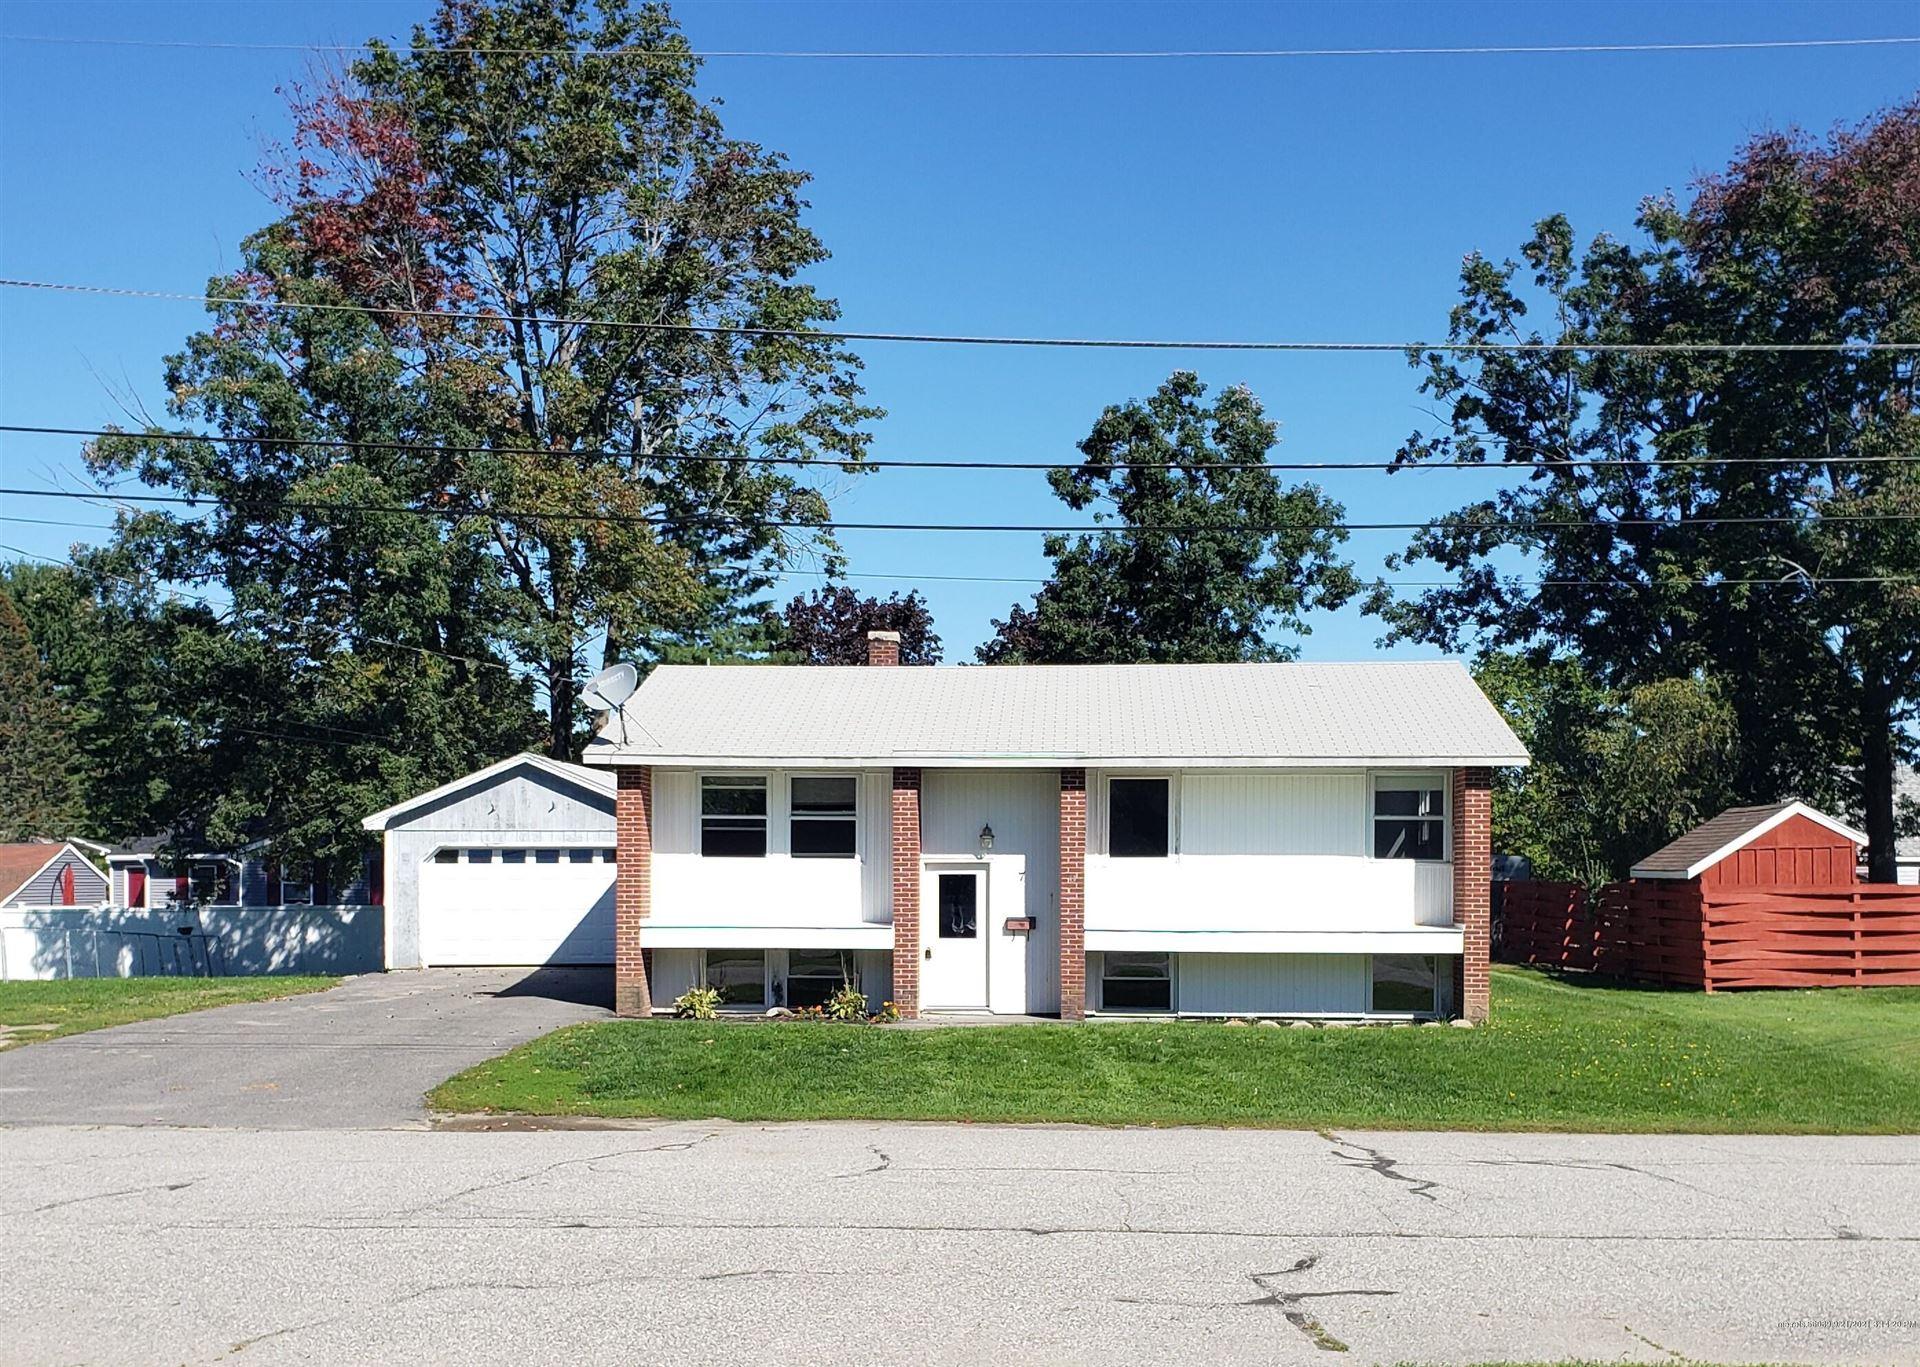 Photo of 7 Sam Street, Winslow, ME 04901 (MLS # 1509657)